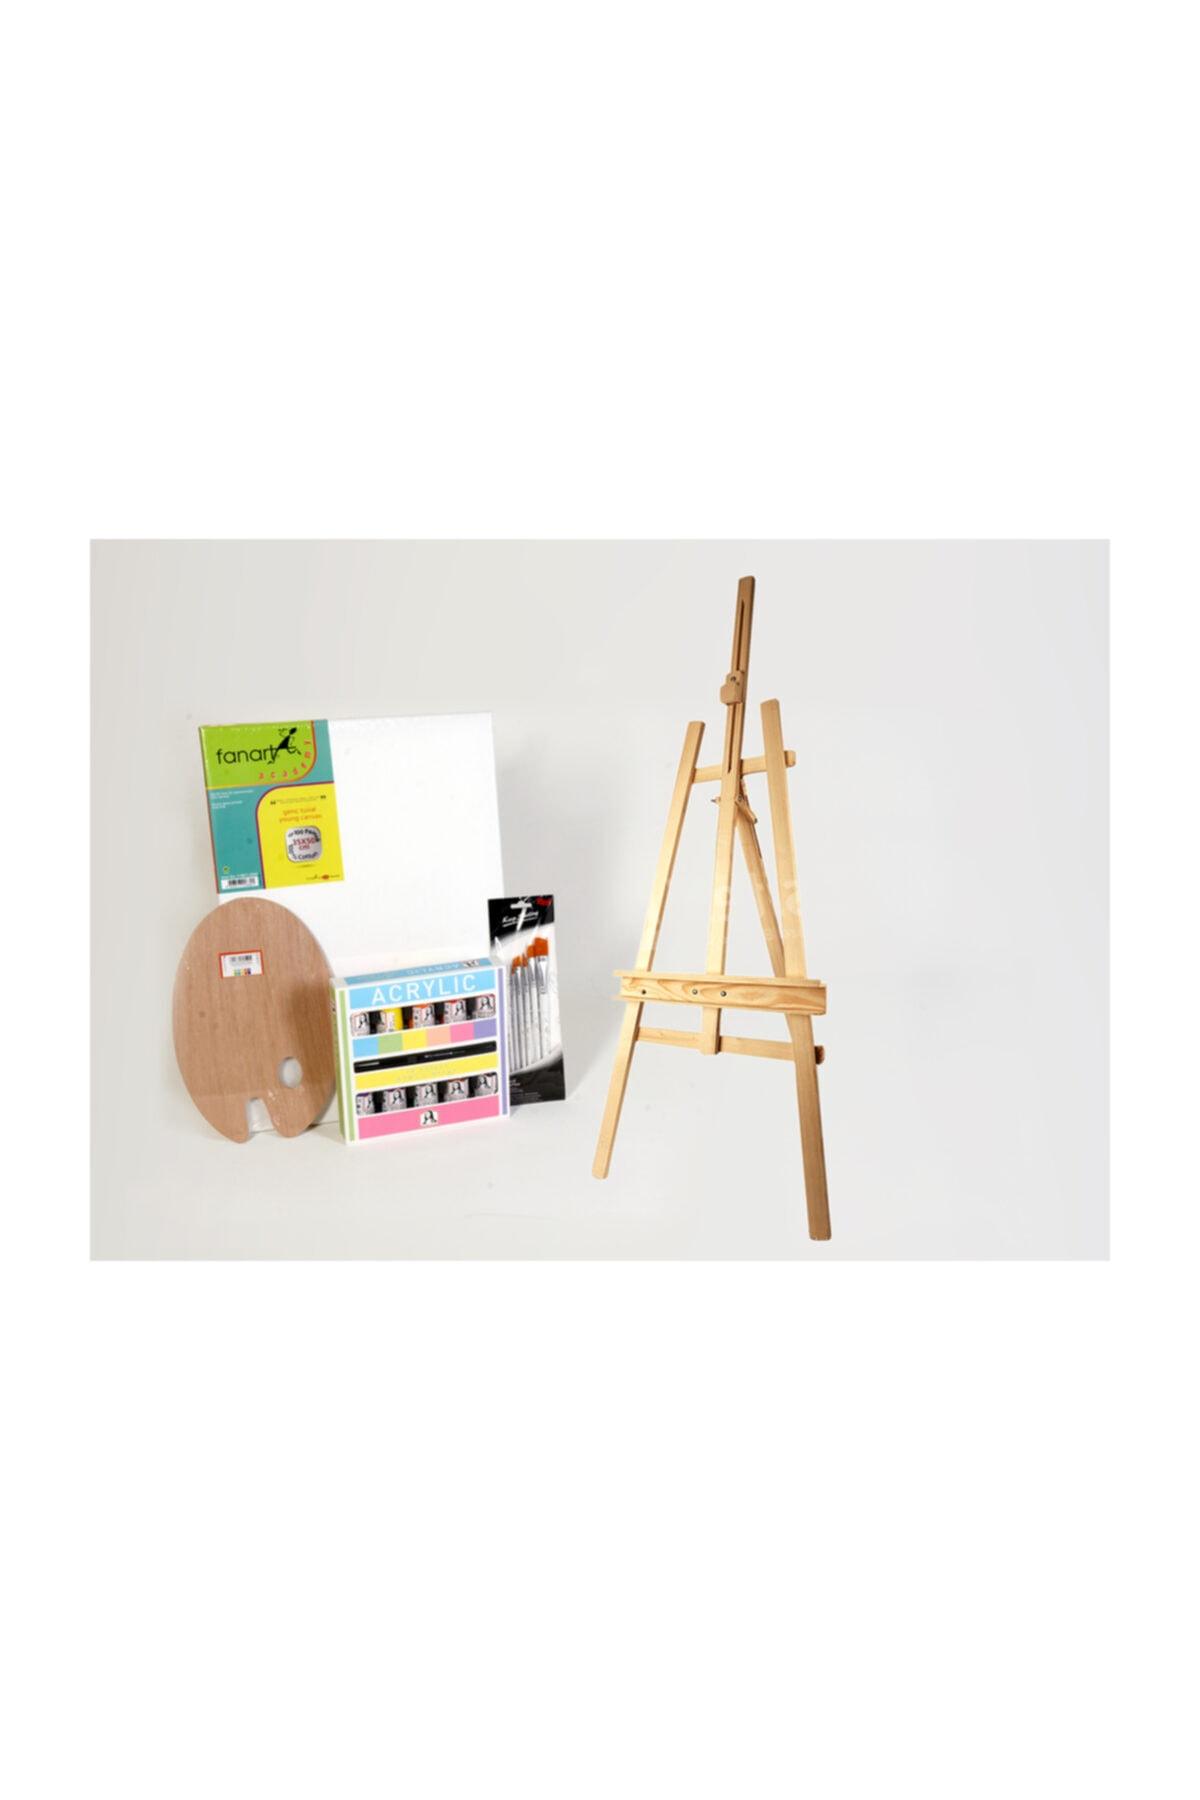 Akrilik Boya Setı Şövalye Rıch Yumusak Fırça Setı Ahşap Palet 35×50 Fanart Tuval Mona Lısa